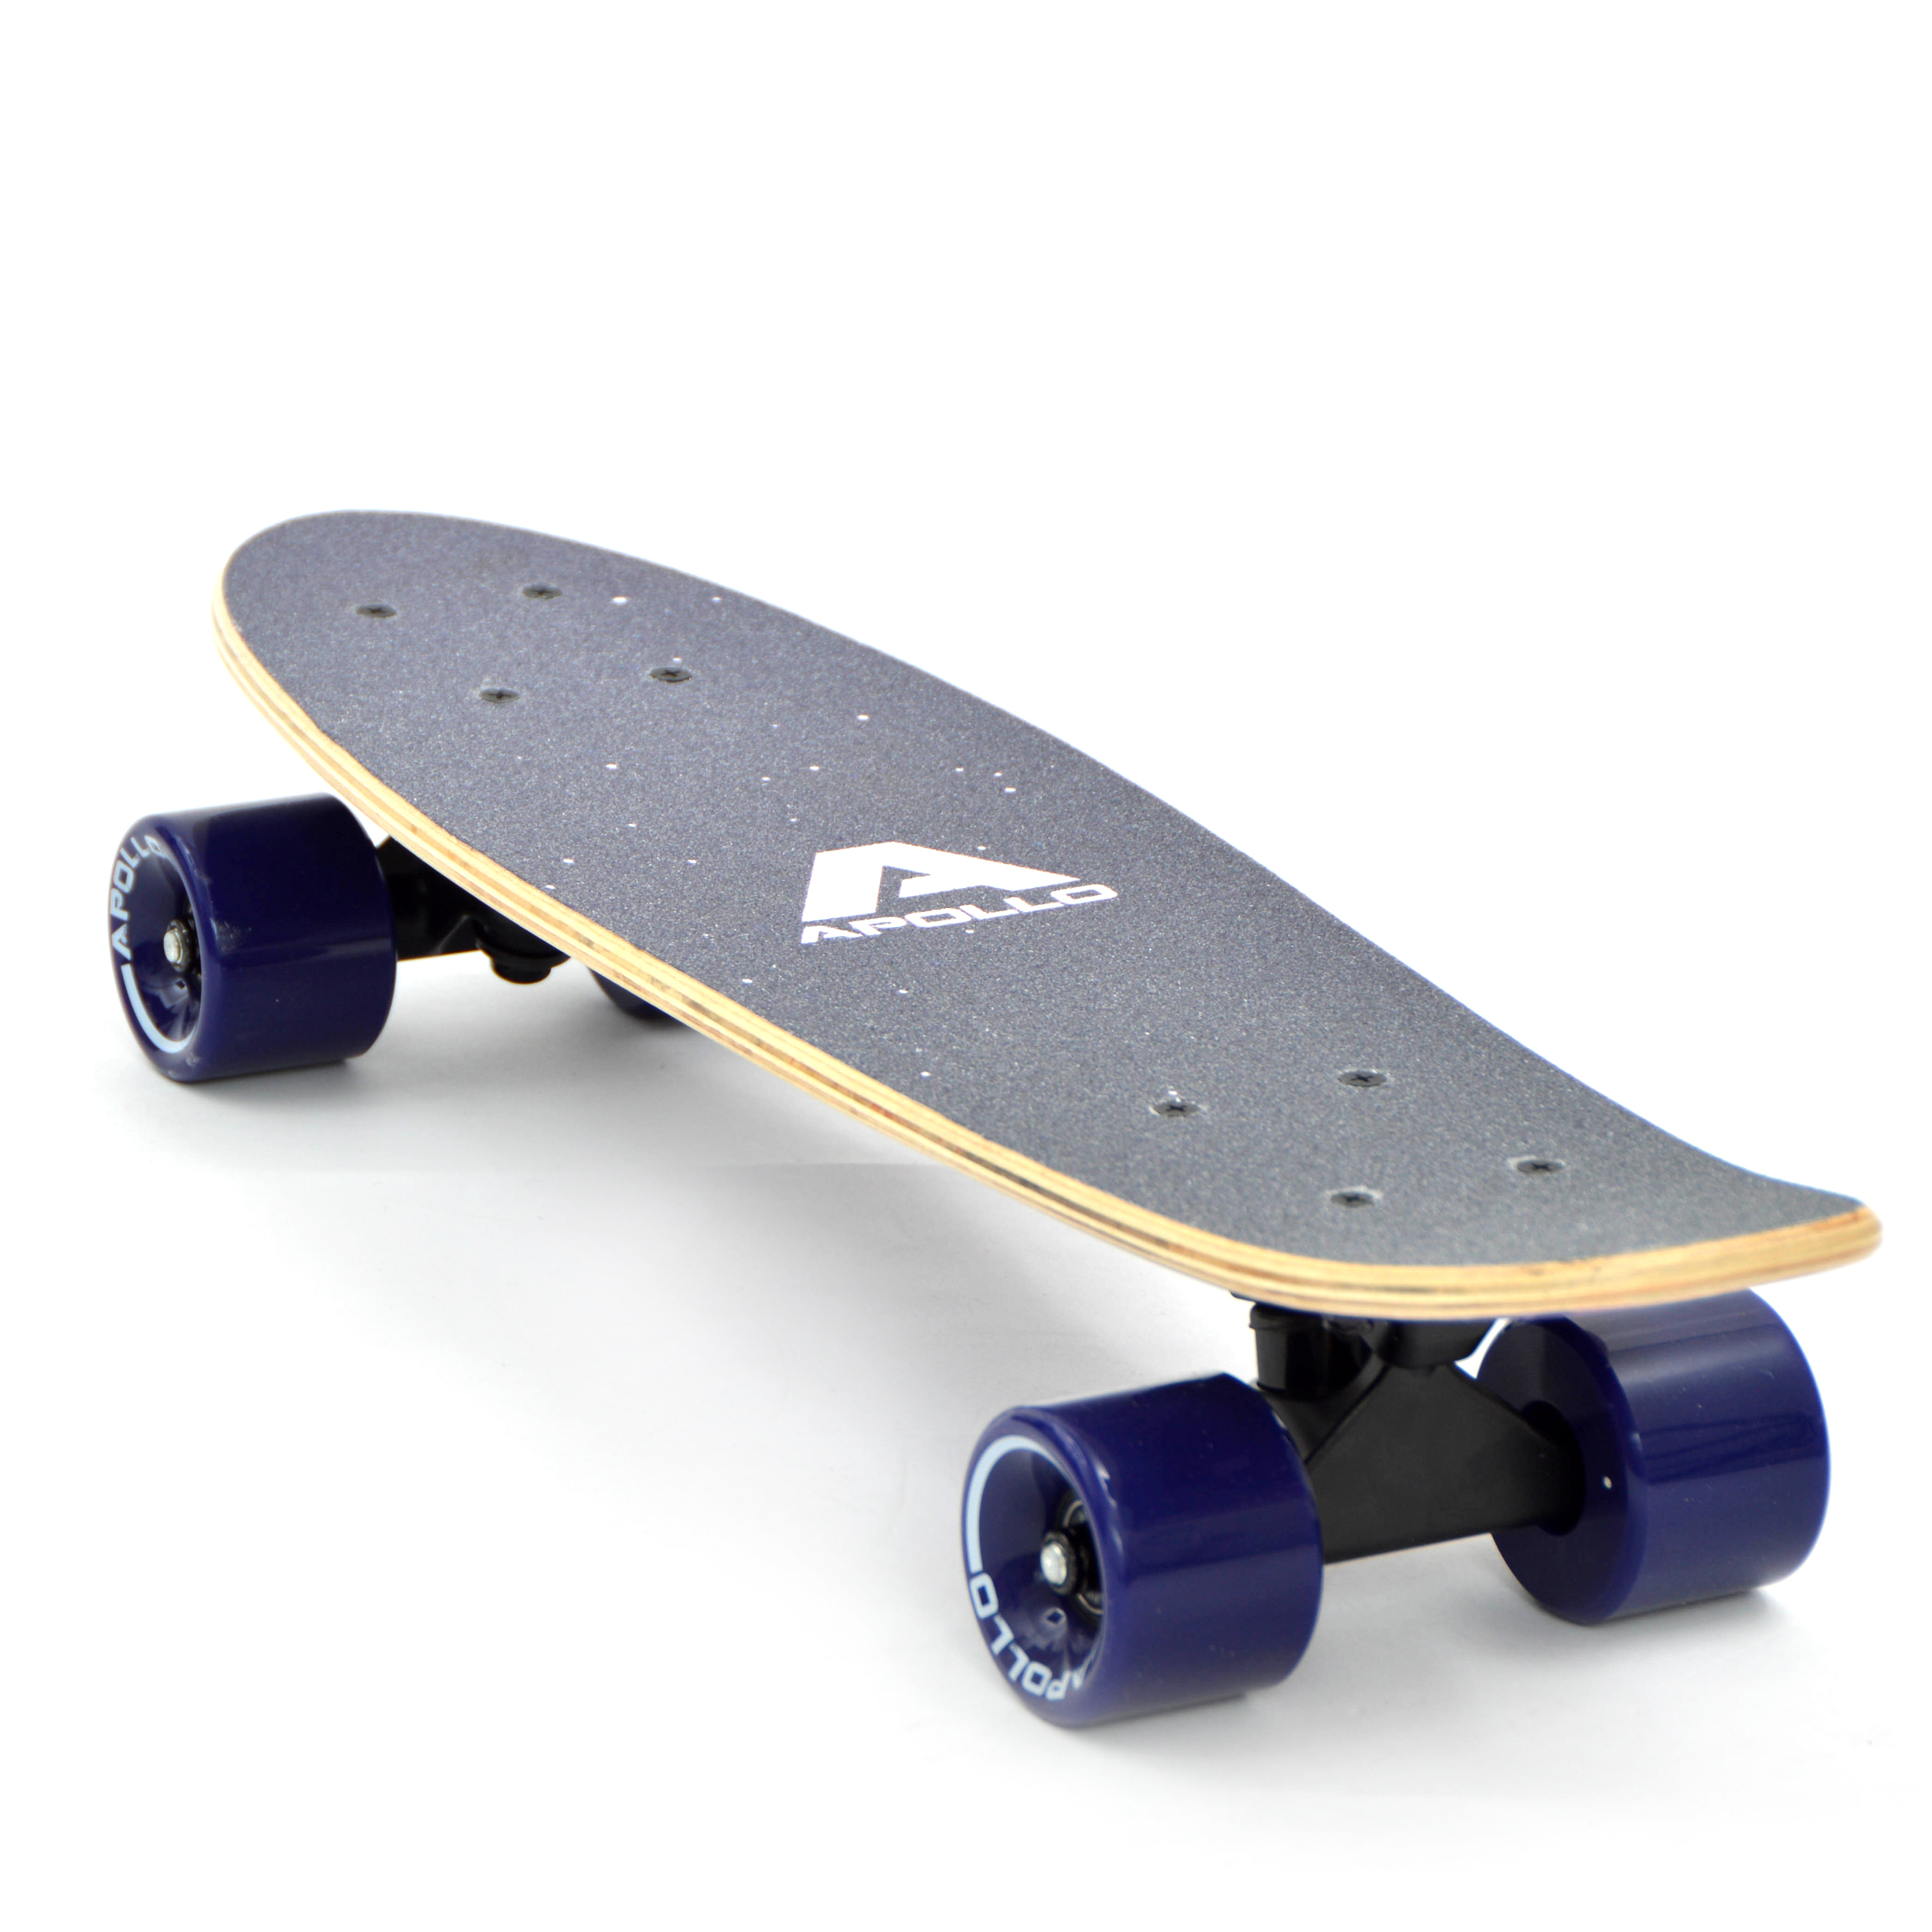 apollo vintage retro wood minicruiser skateboard. Black Bedroom Furniture Sets. Home Design Ideas